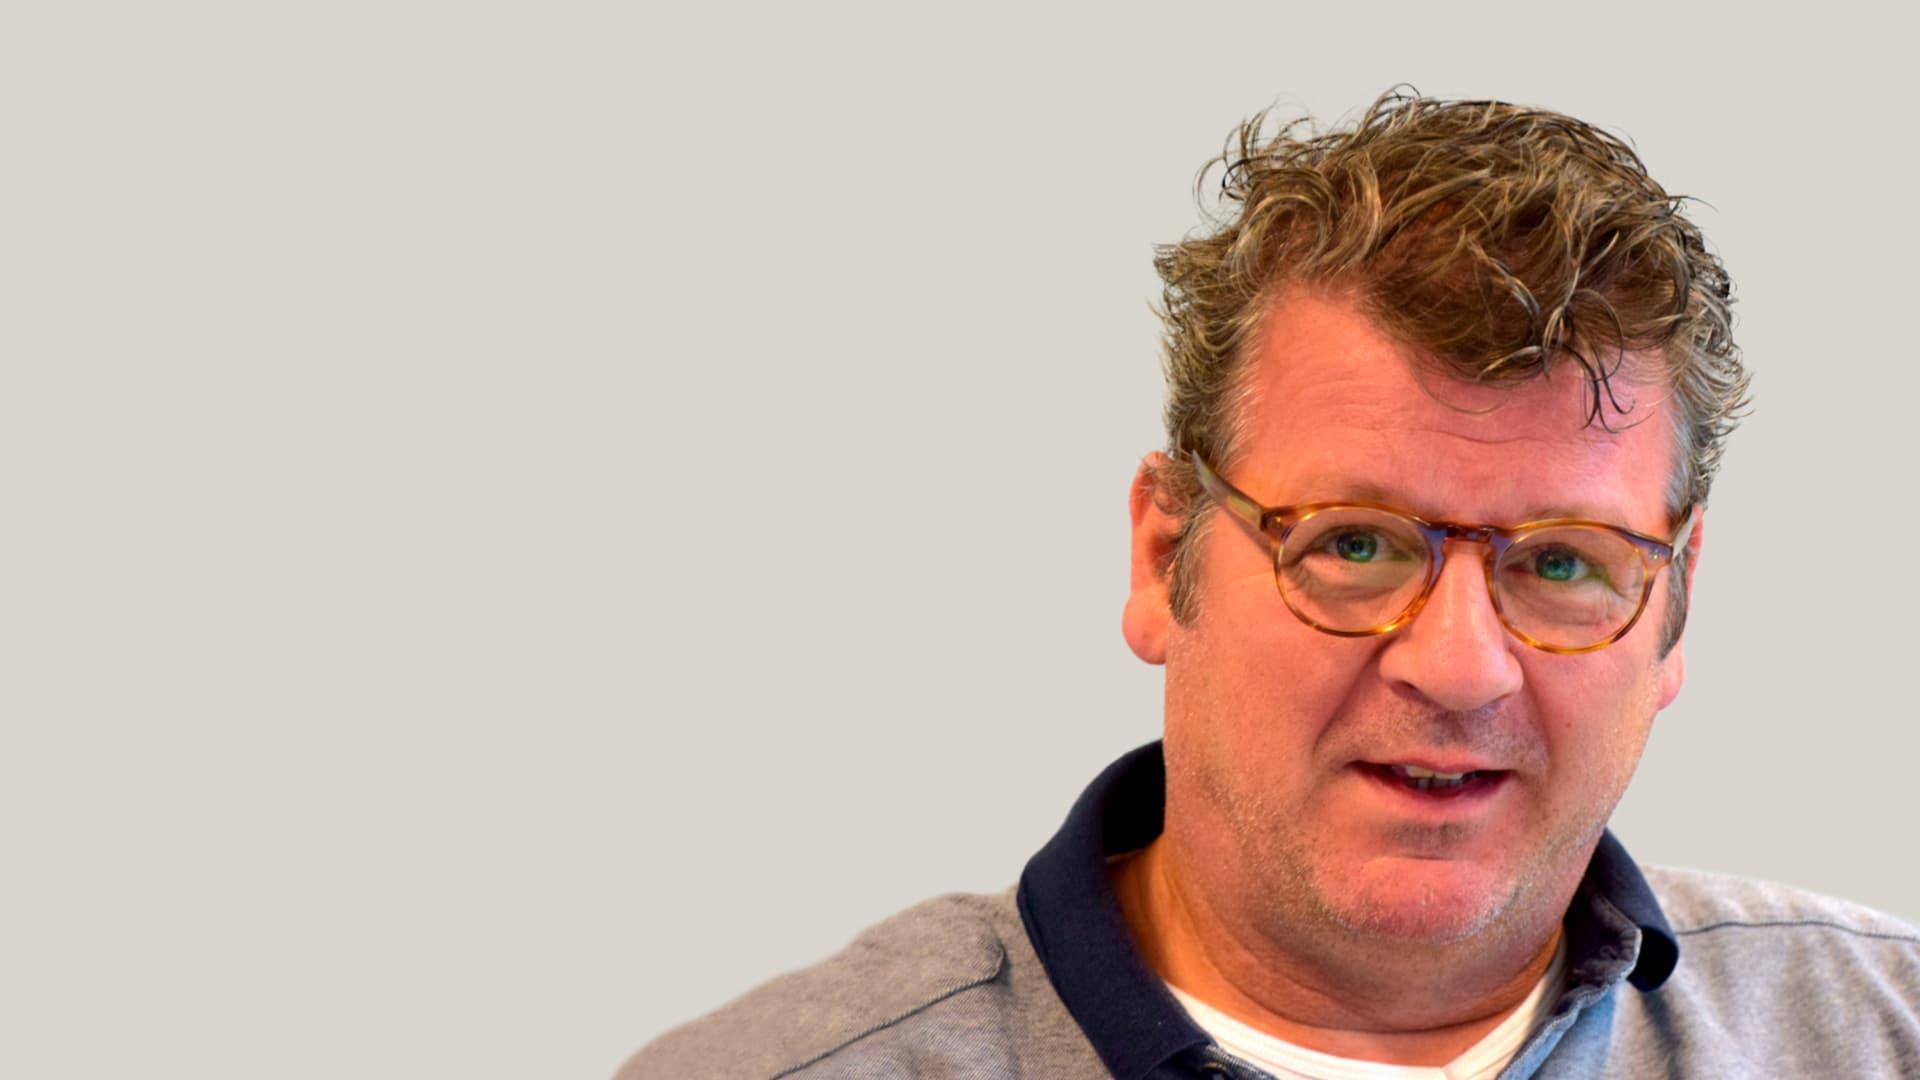 profile picture of Nils Kijkuit